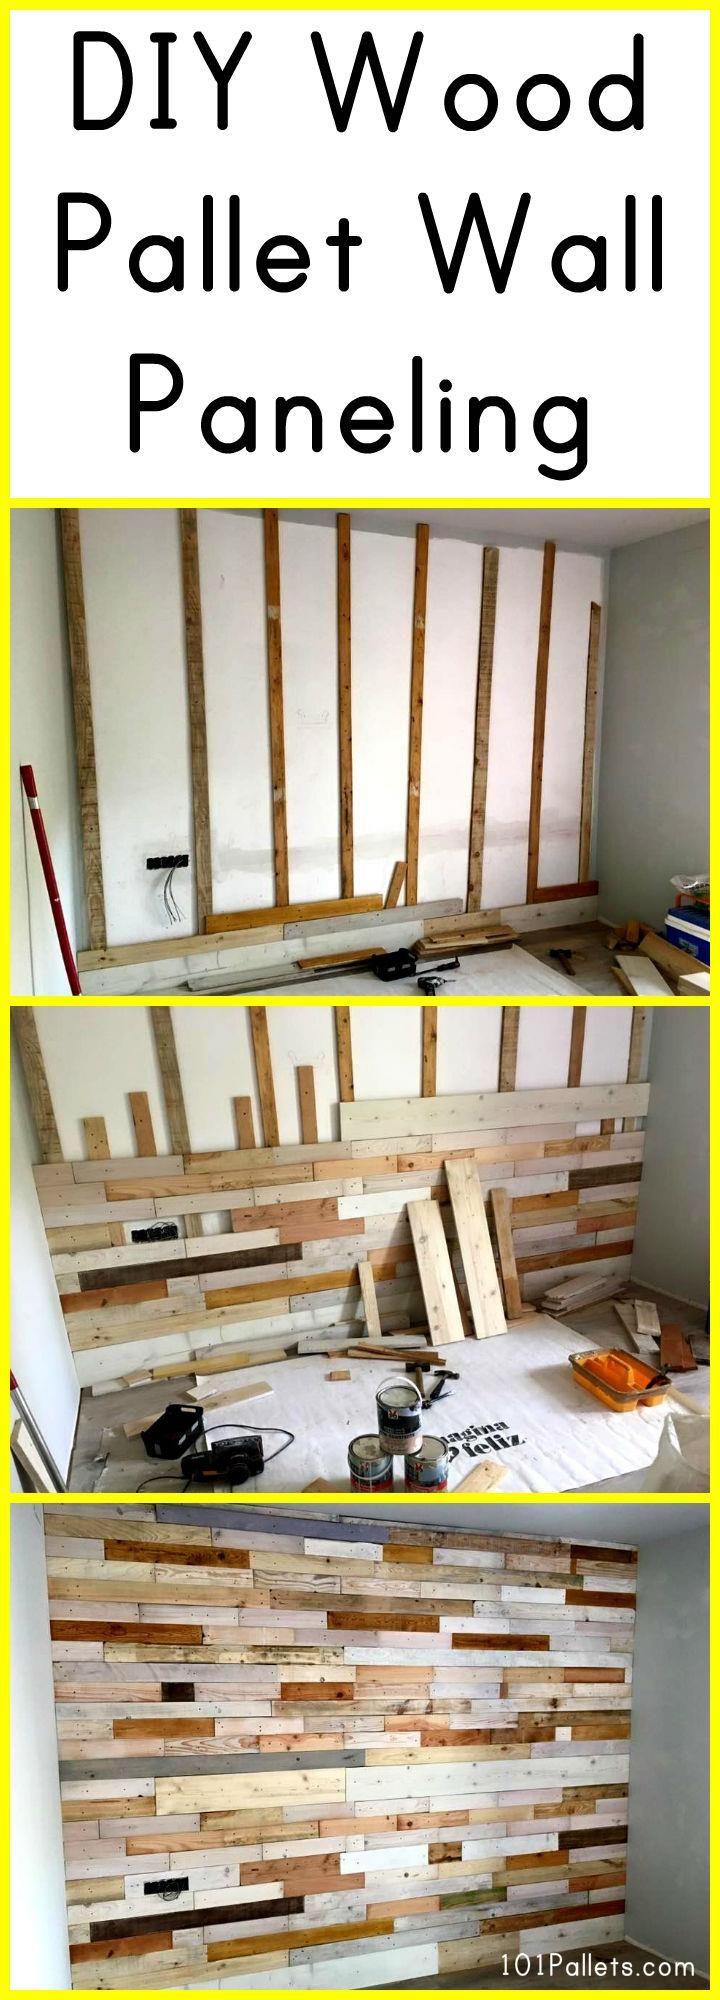 DIY Wood Pallet Wall Paneling